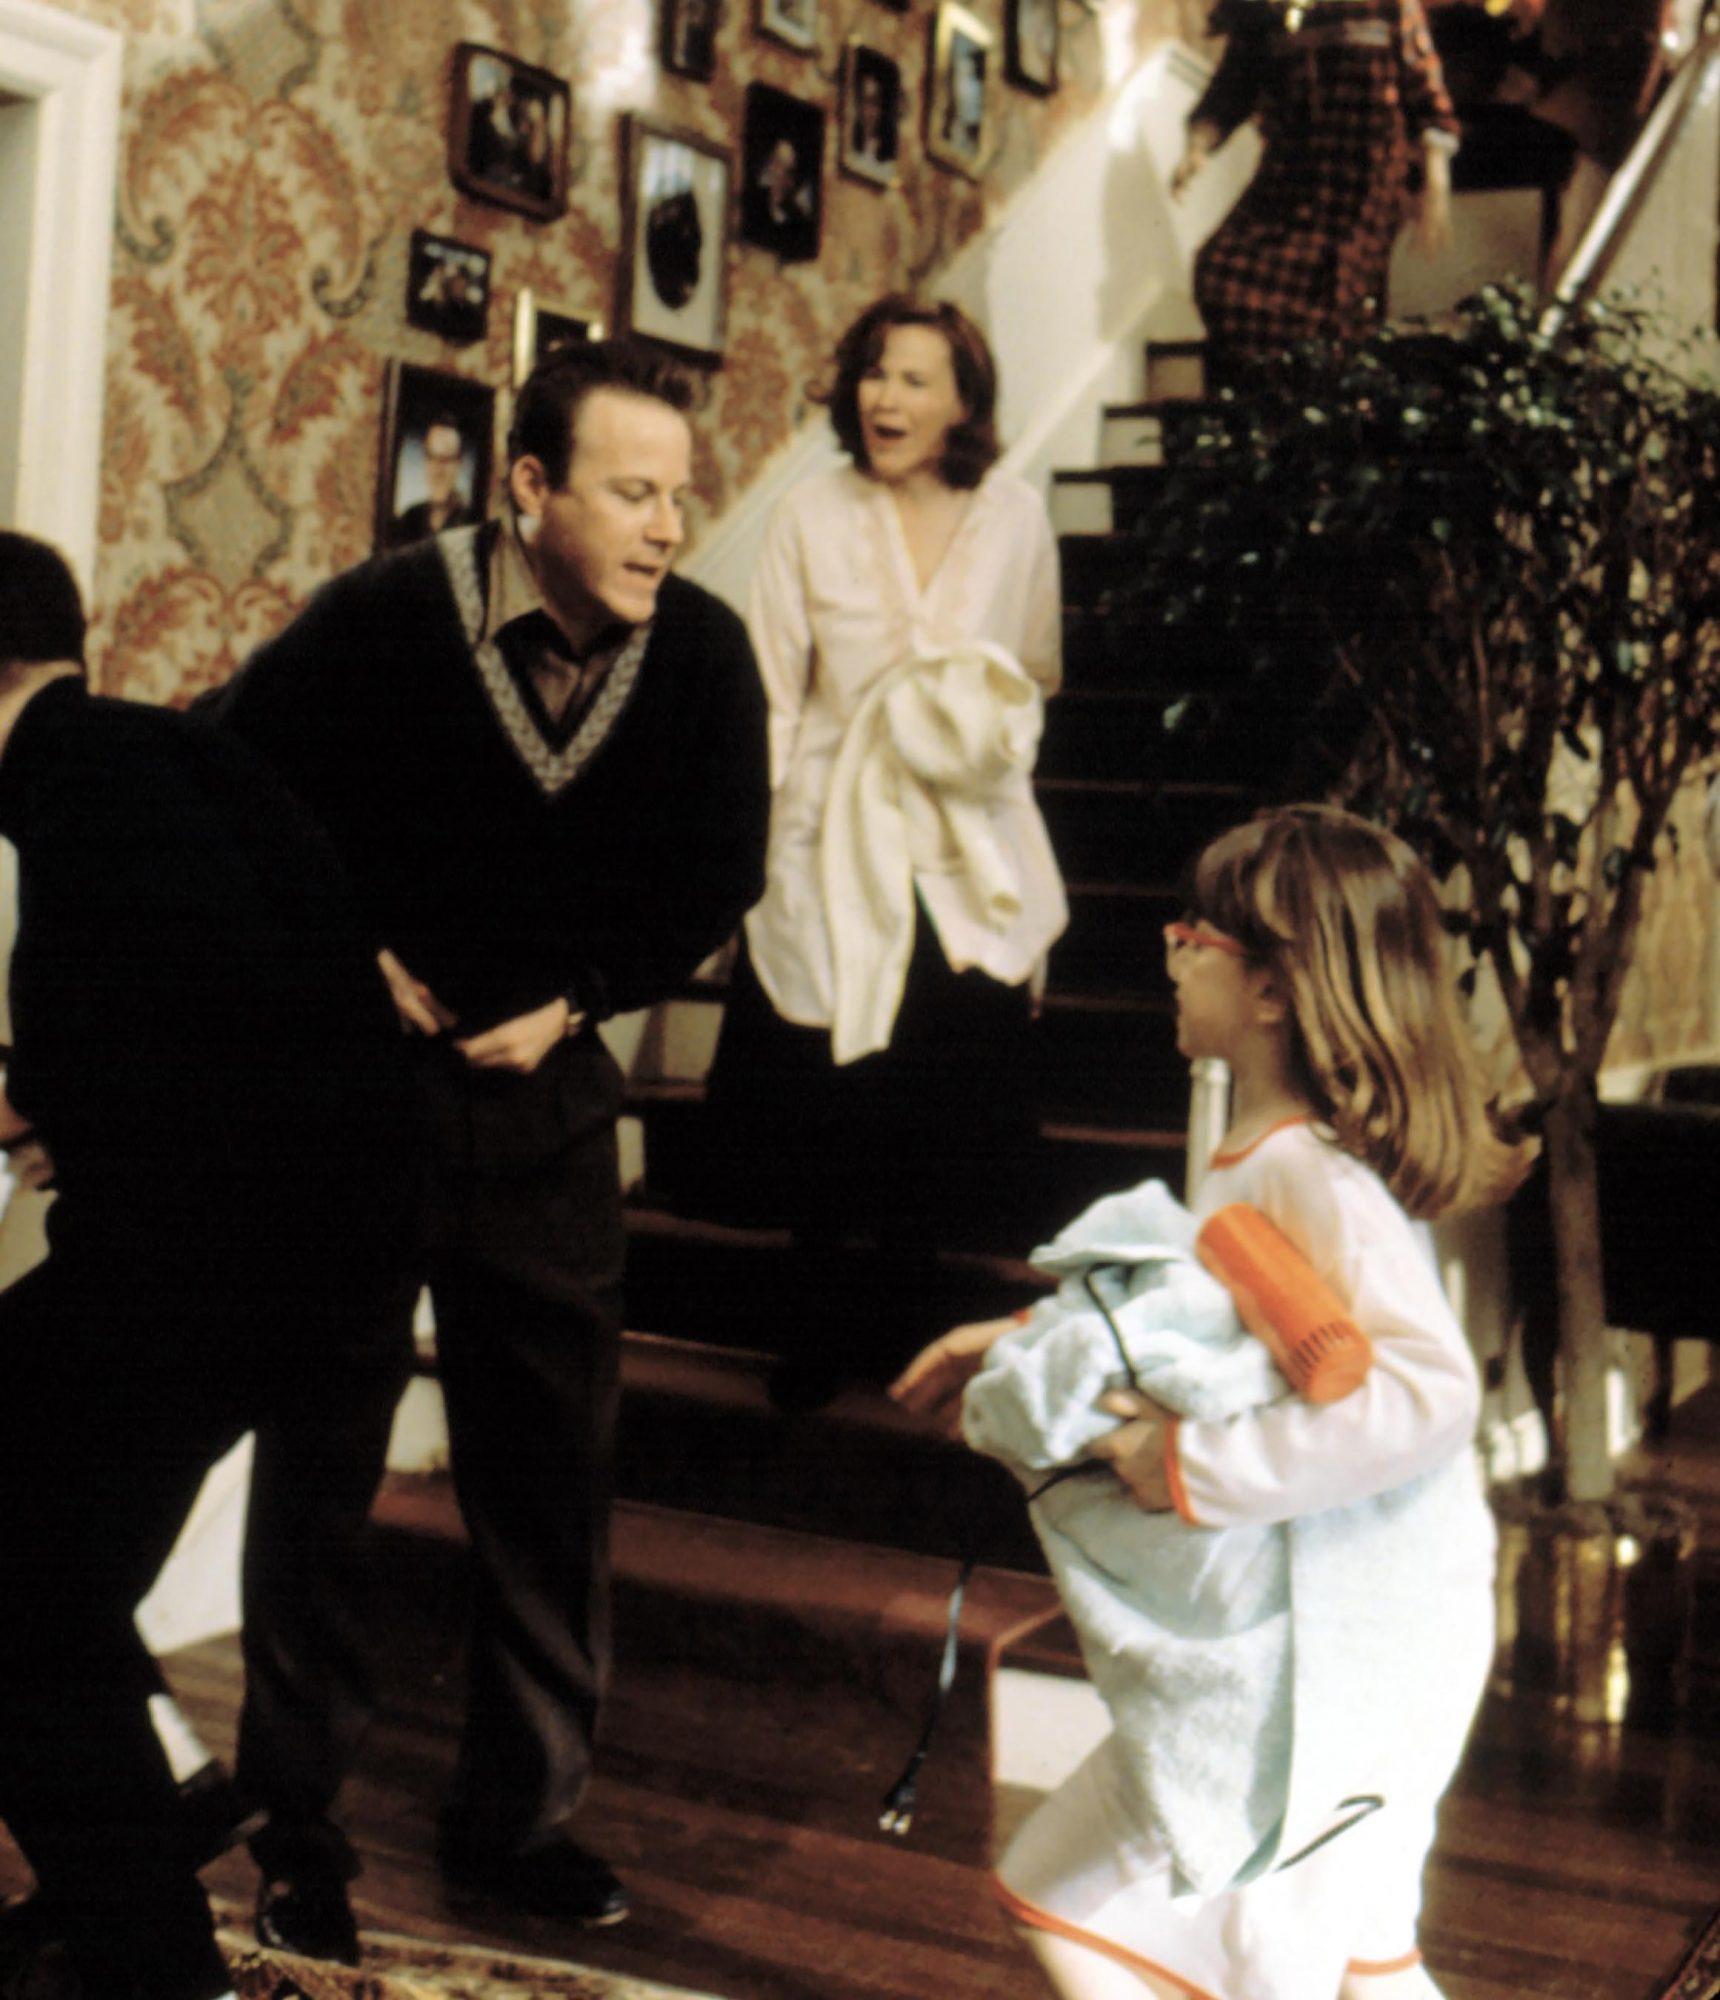 HOME ALONE, John Heard, Catherine O'Hara, ?, 1990, TM and Copyright (c) 20th Century Fox Film Corp.